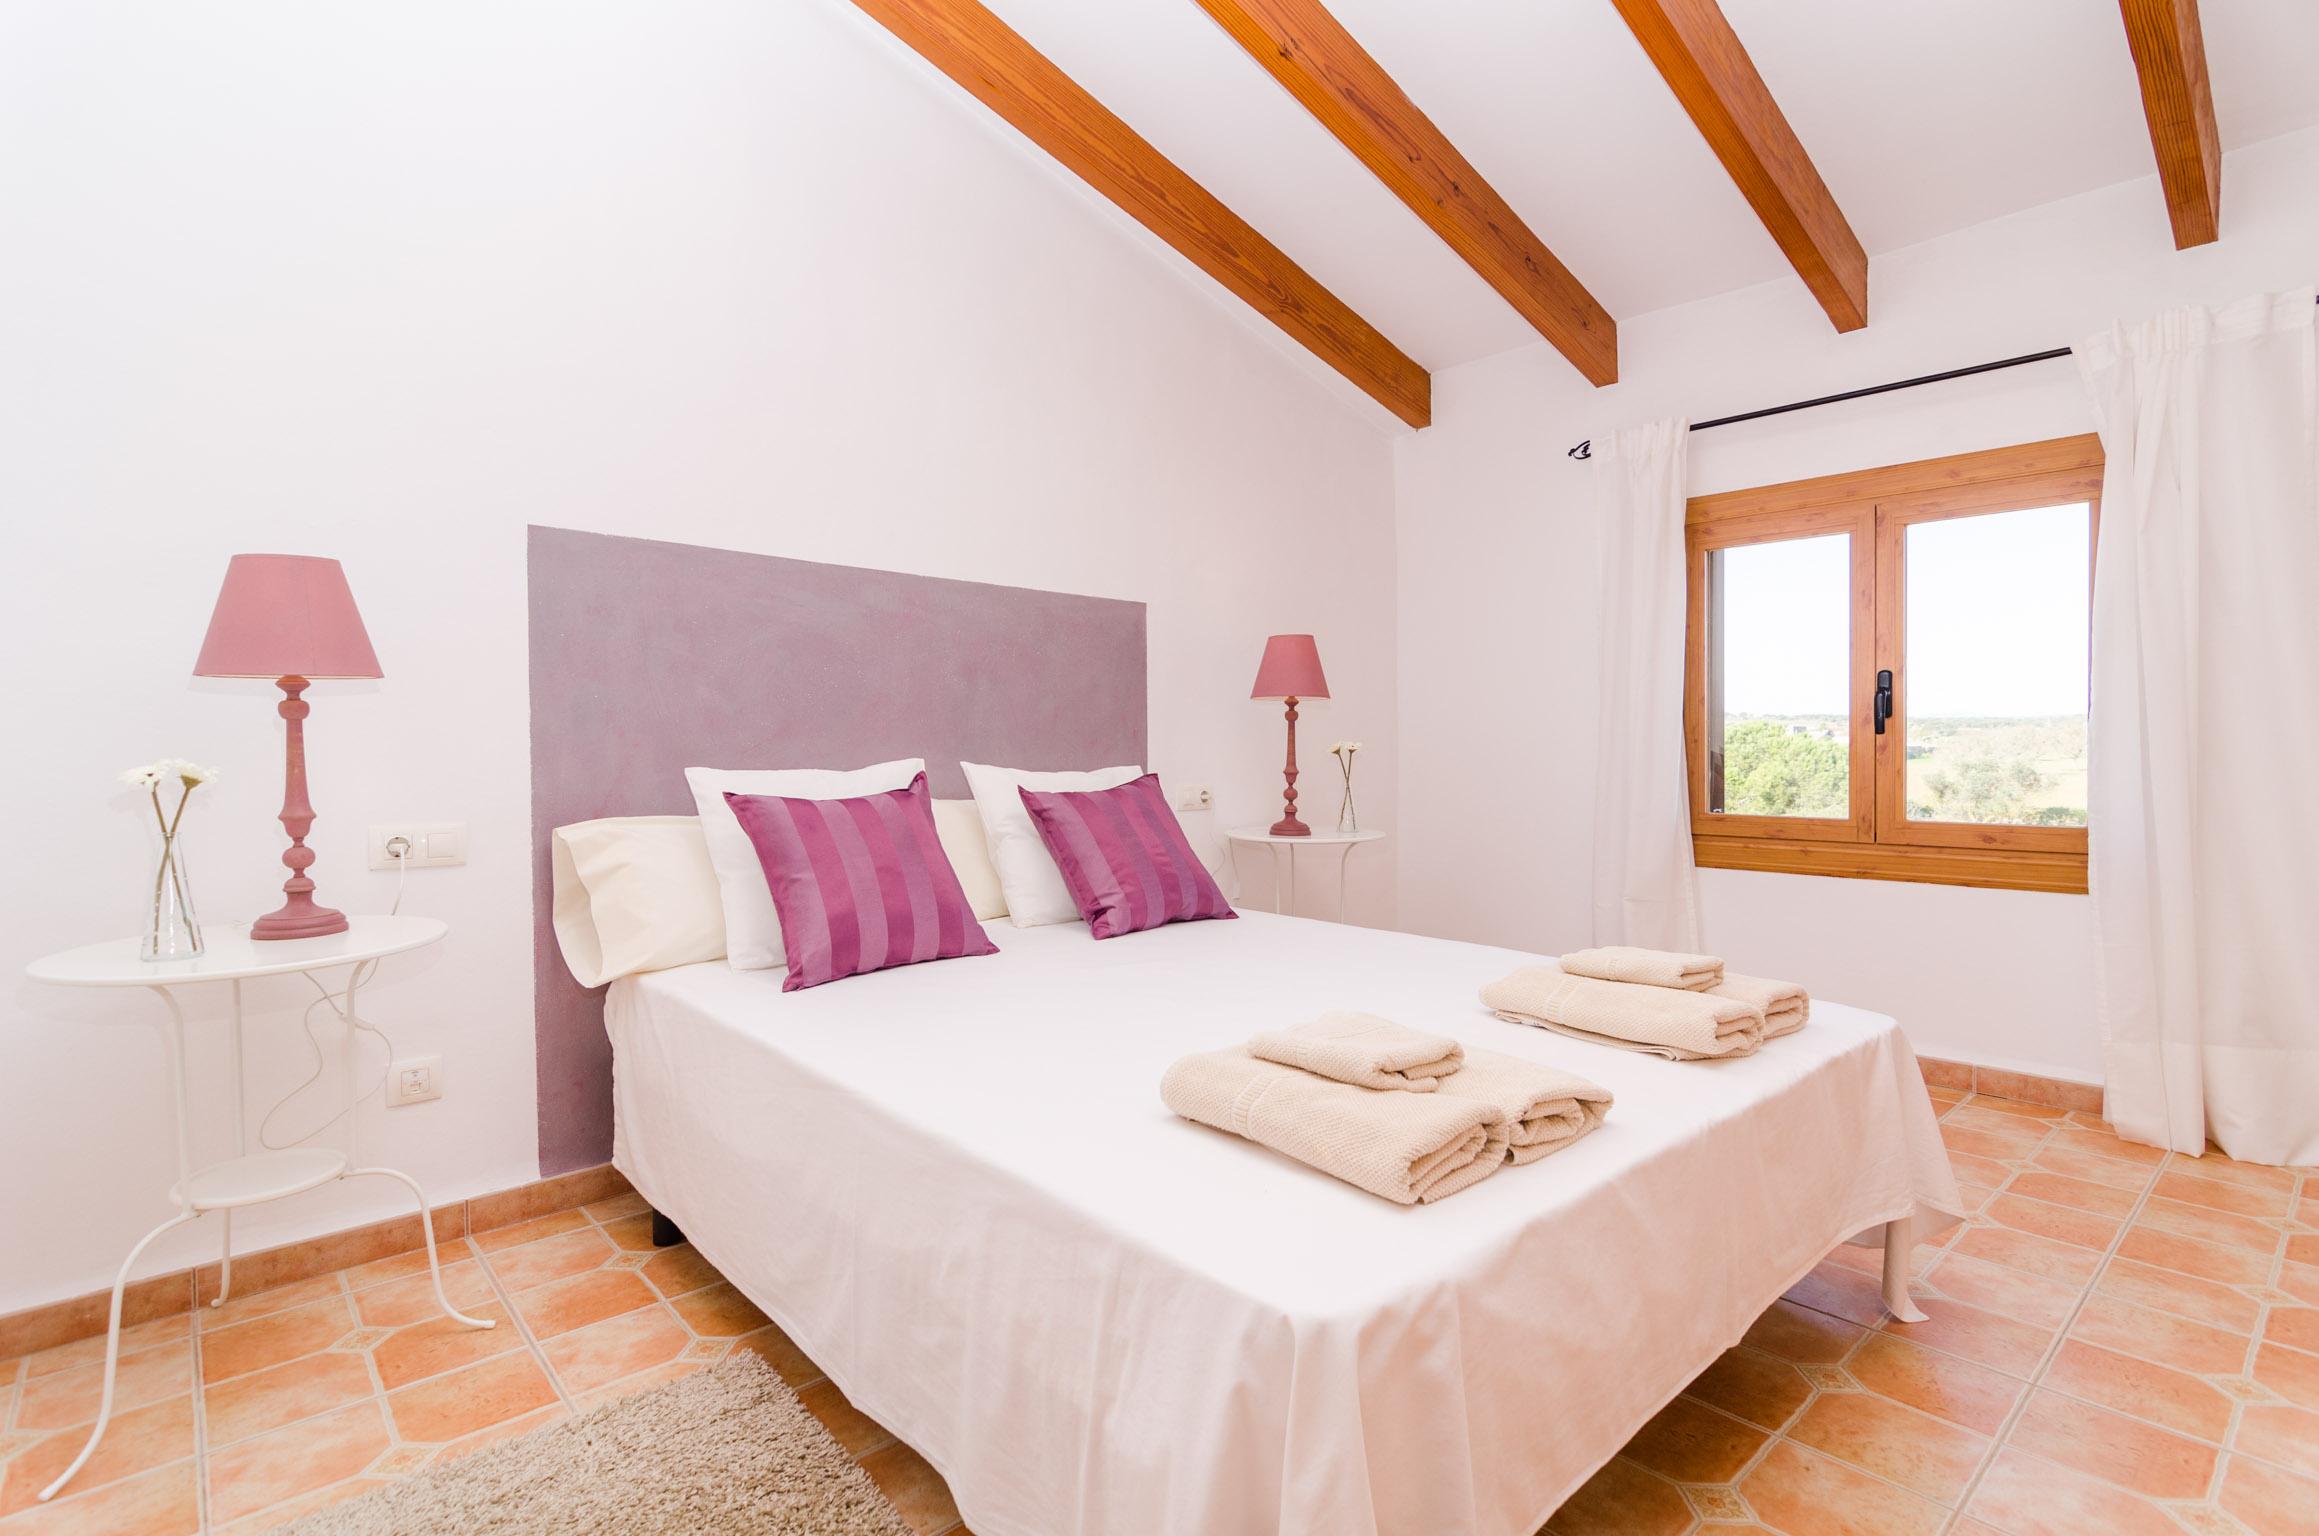 Ferienhaus SANT BLAI VELL (2284789), Campos, Mallorca, Balearische Inseln, Spanien, Bild 17